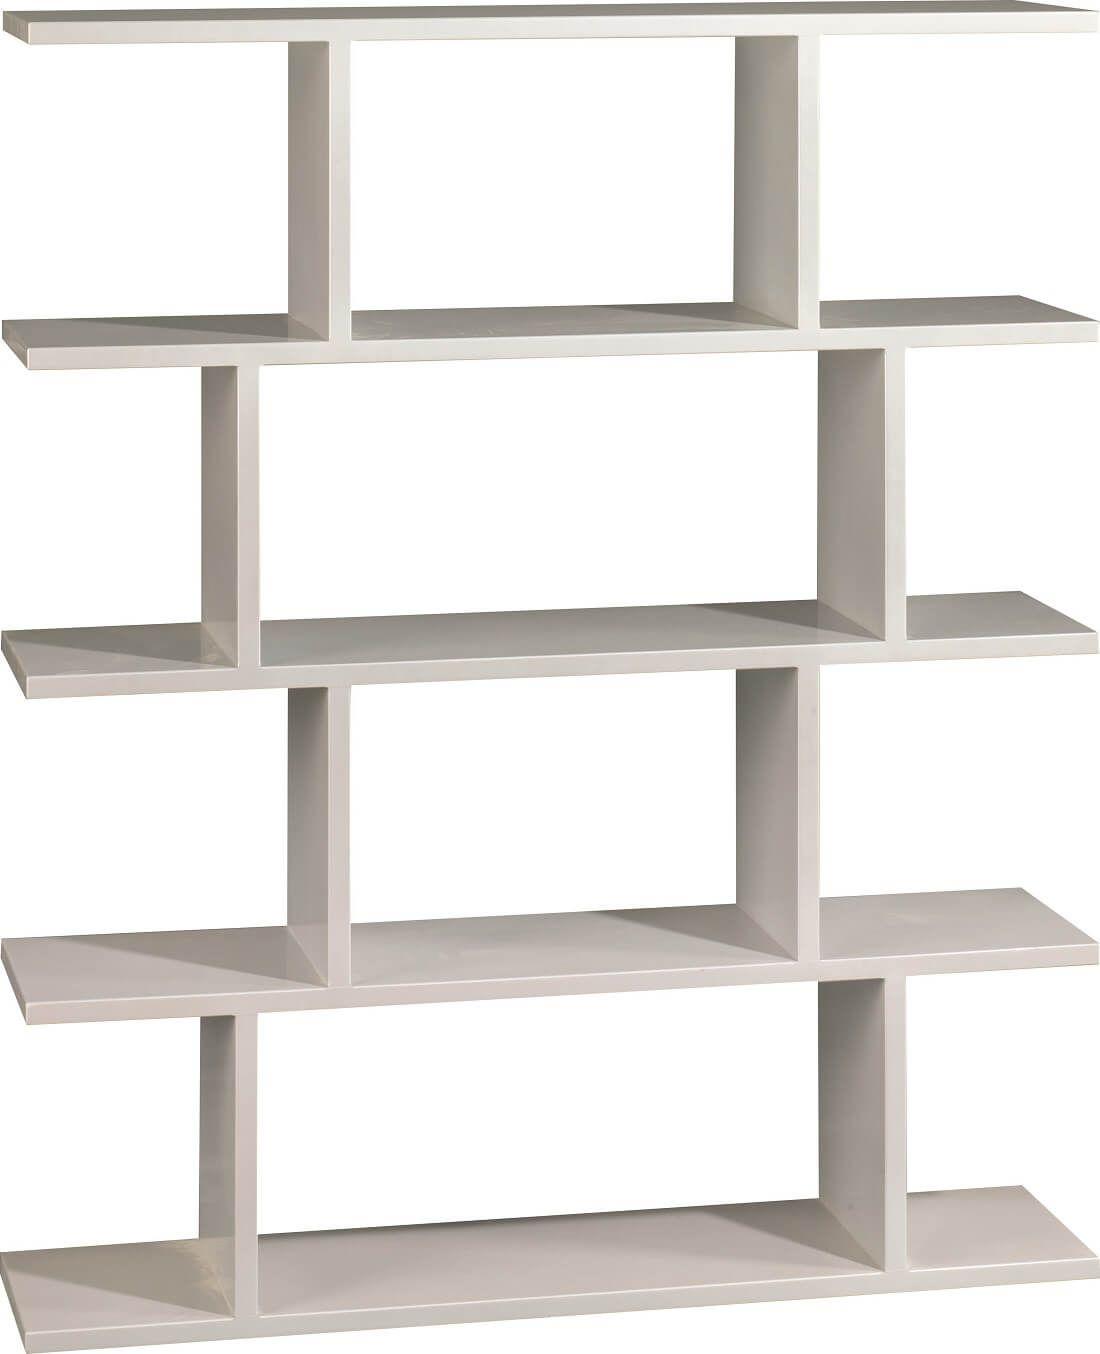 Painted Contemporary Bookshelf